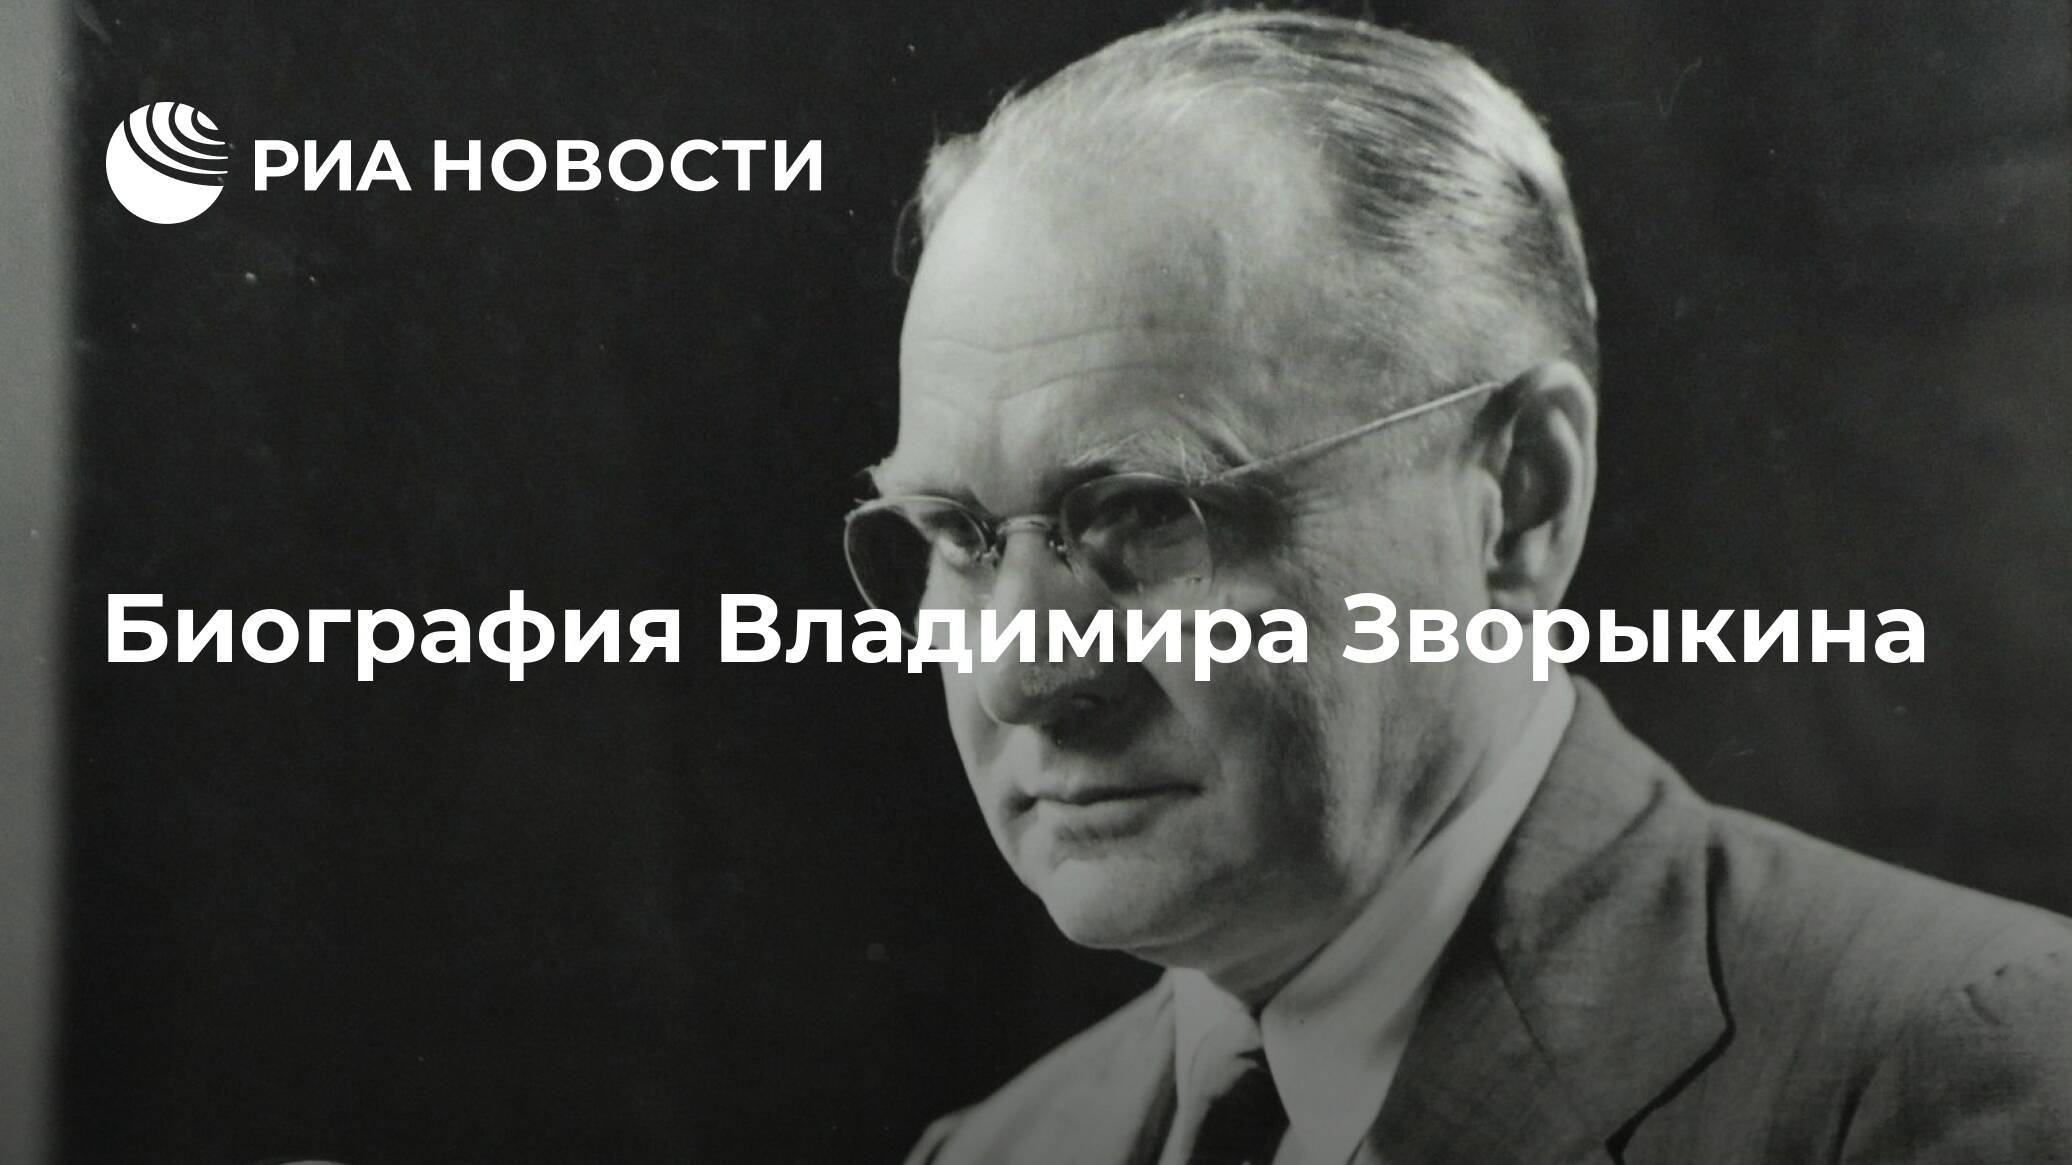 Владимир козьмич зворыкин - вики